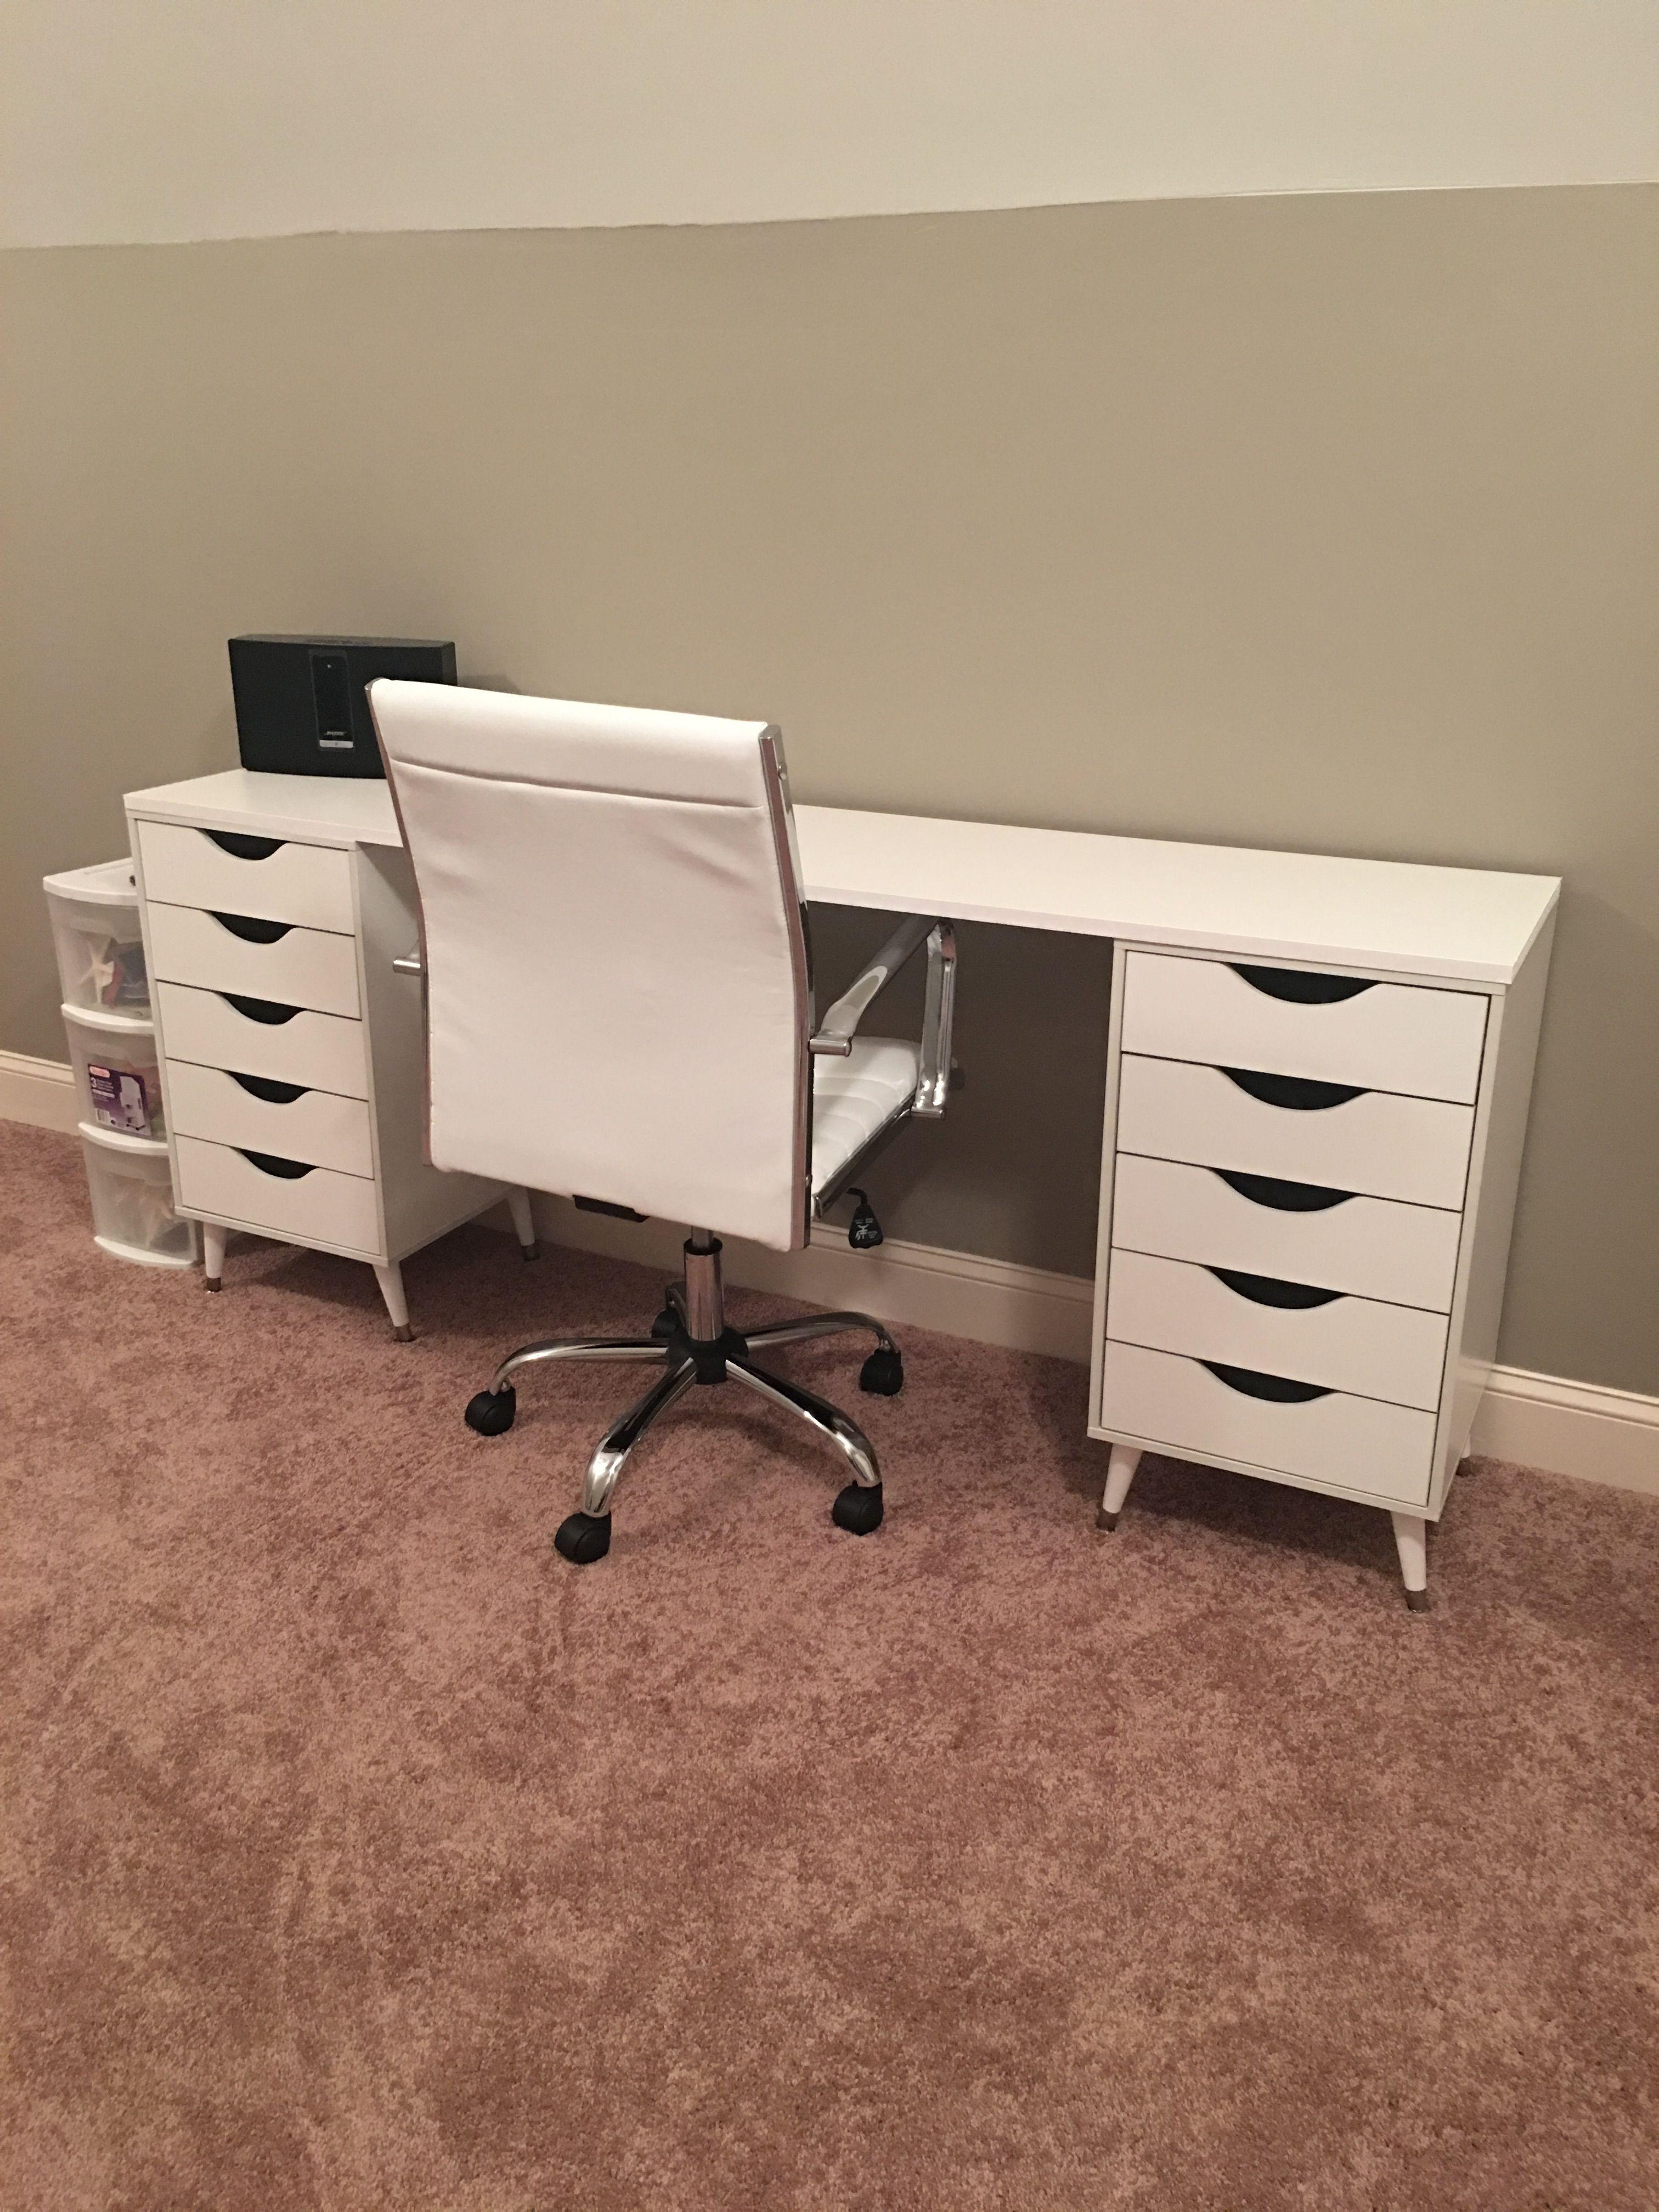 DIY IKEA Dupe Vanity / Writing Desk 6 feet Ikea diy